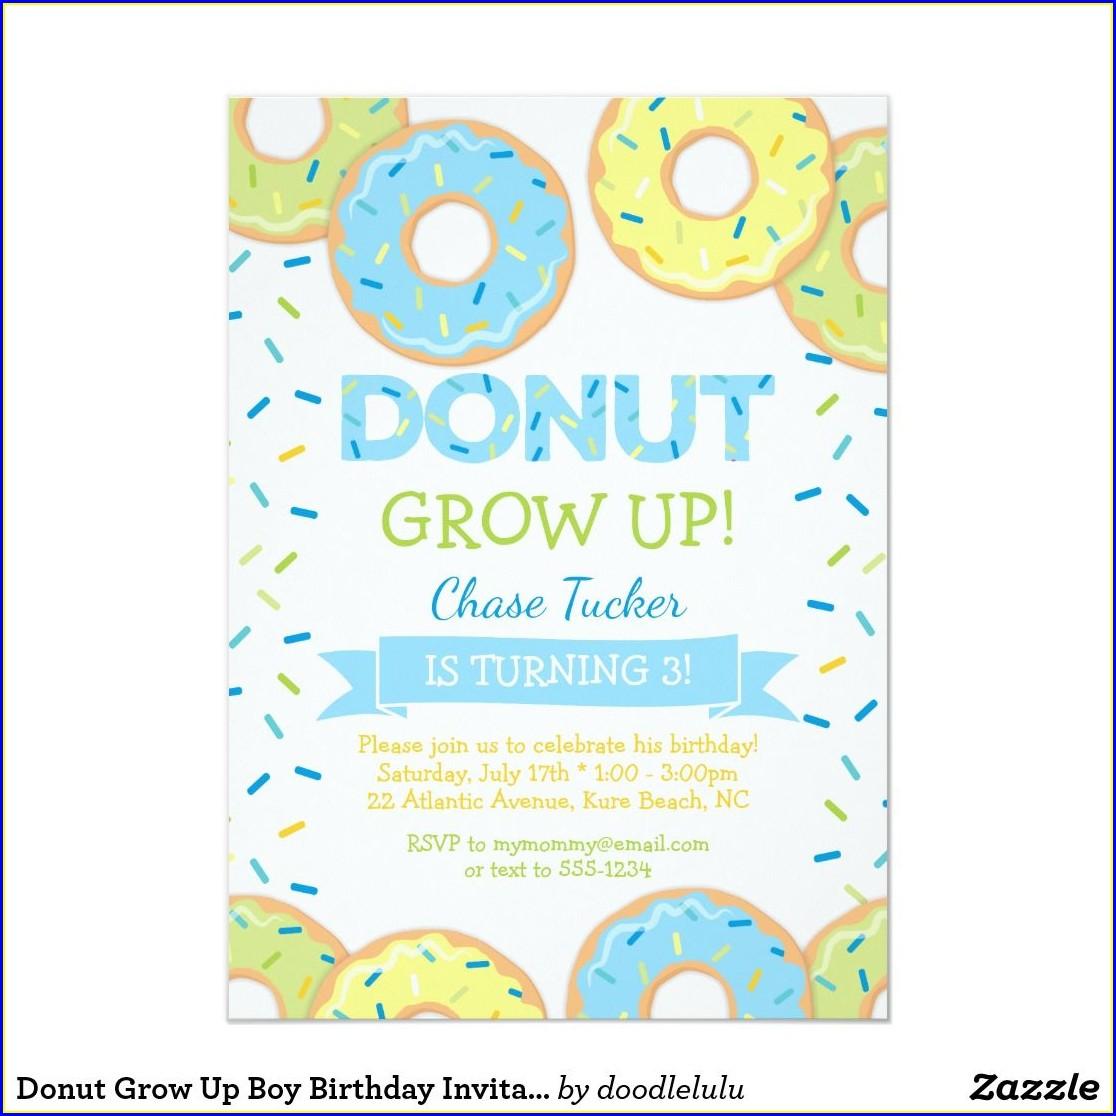 Donut Grow Up Invitations Boy